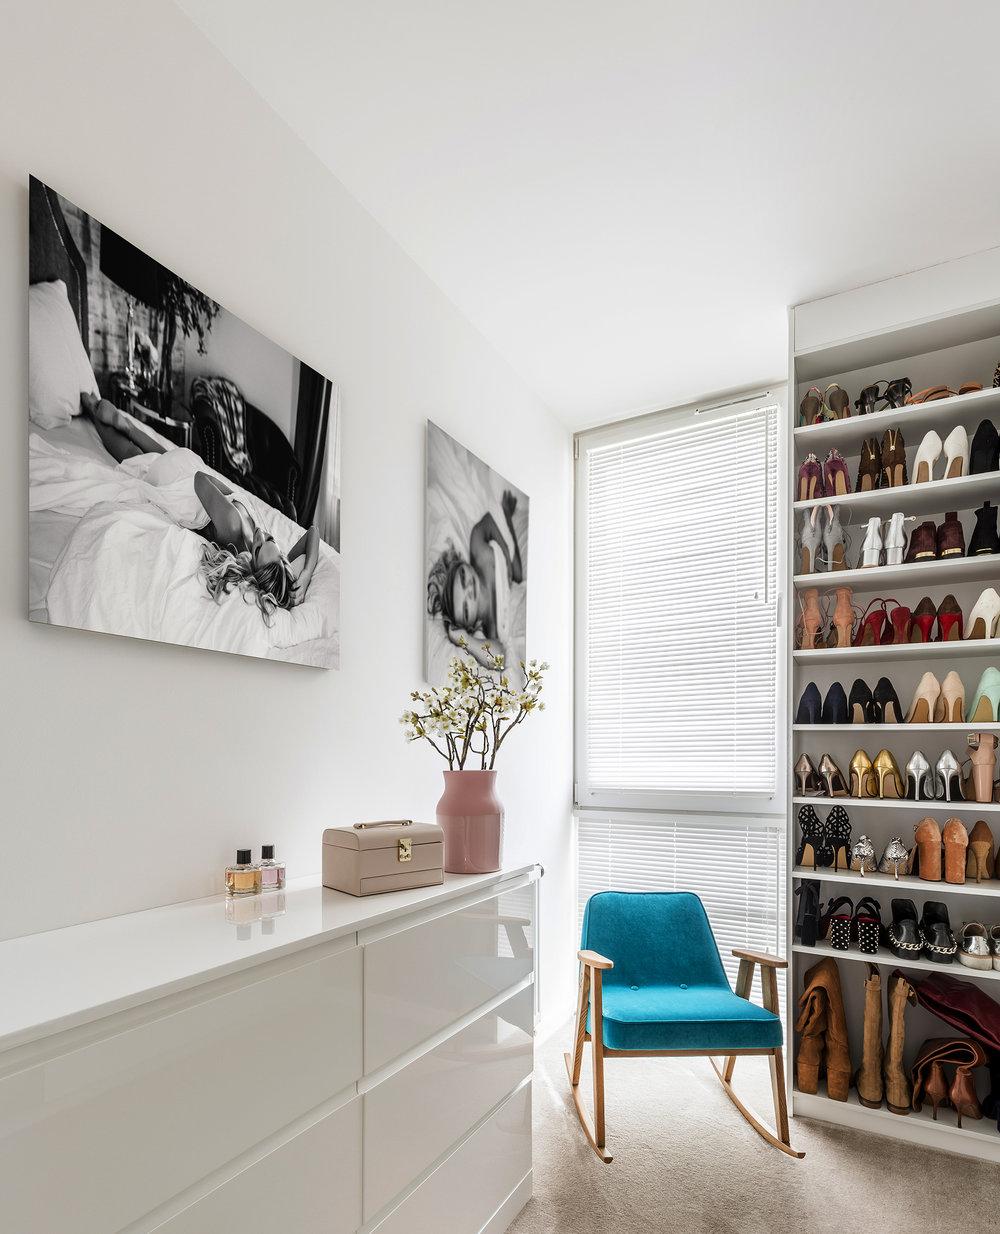 boudoir-closet-art-boudoirbymarie-sm.jpg